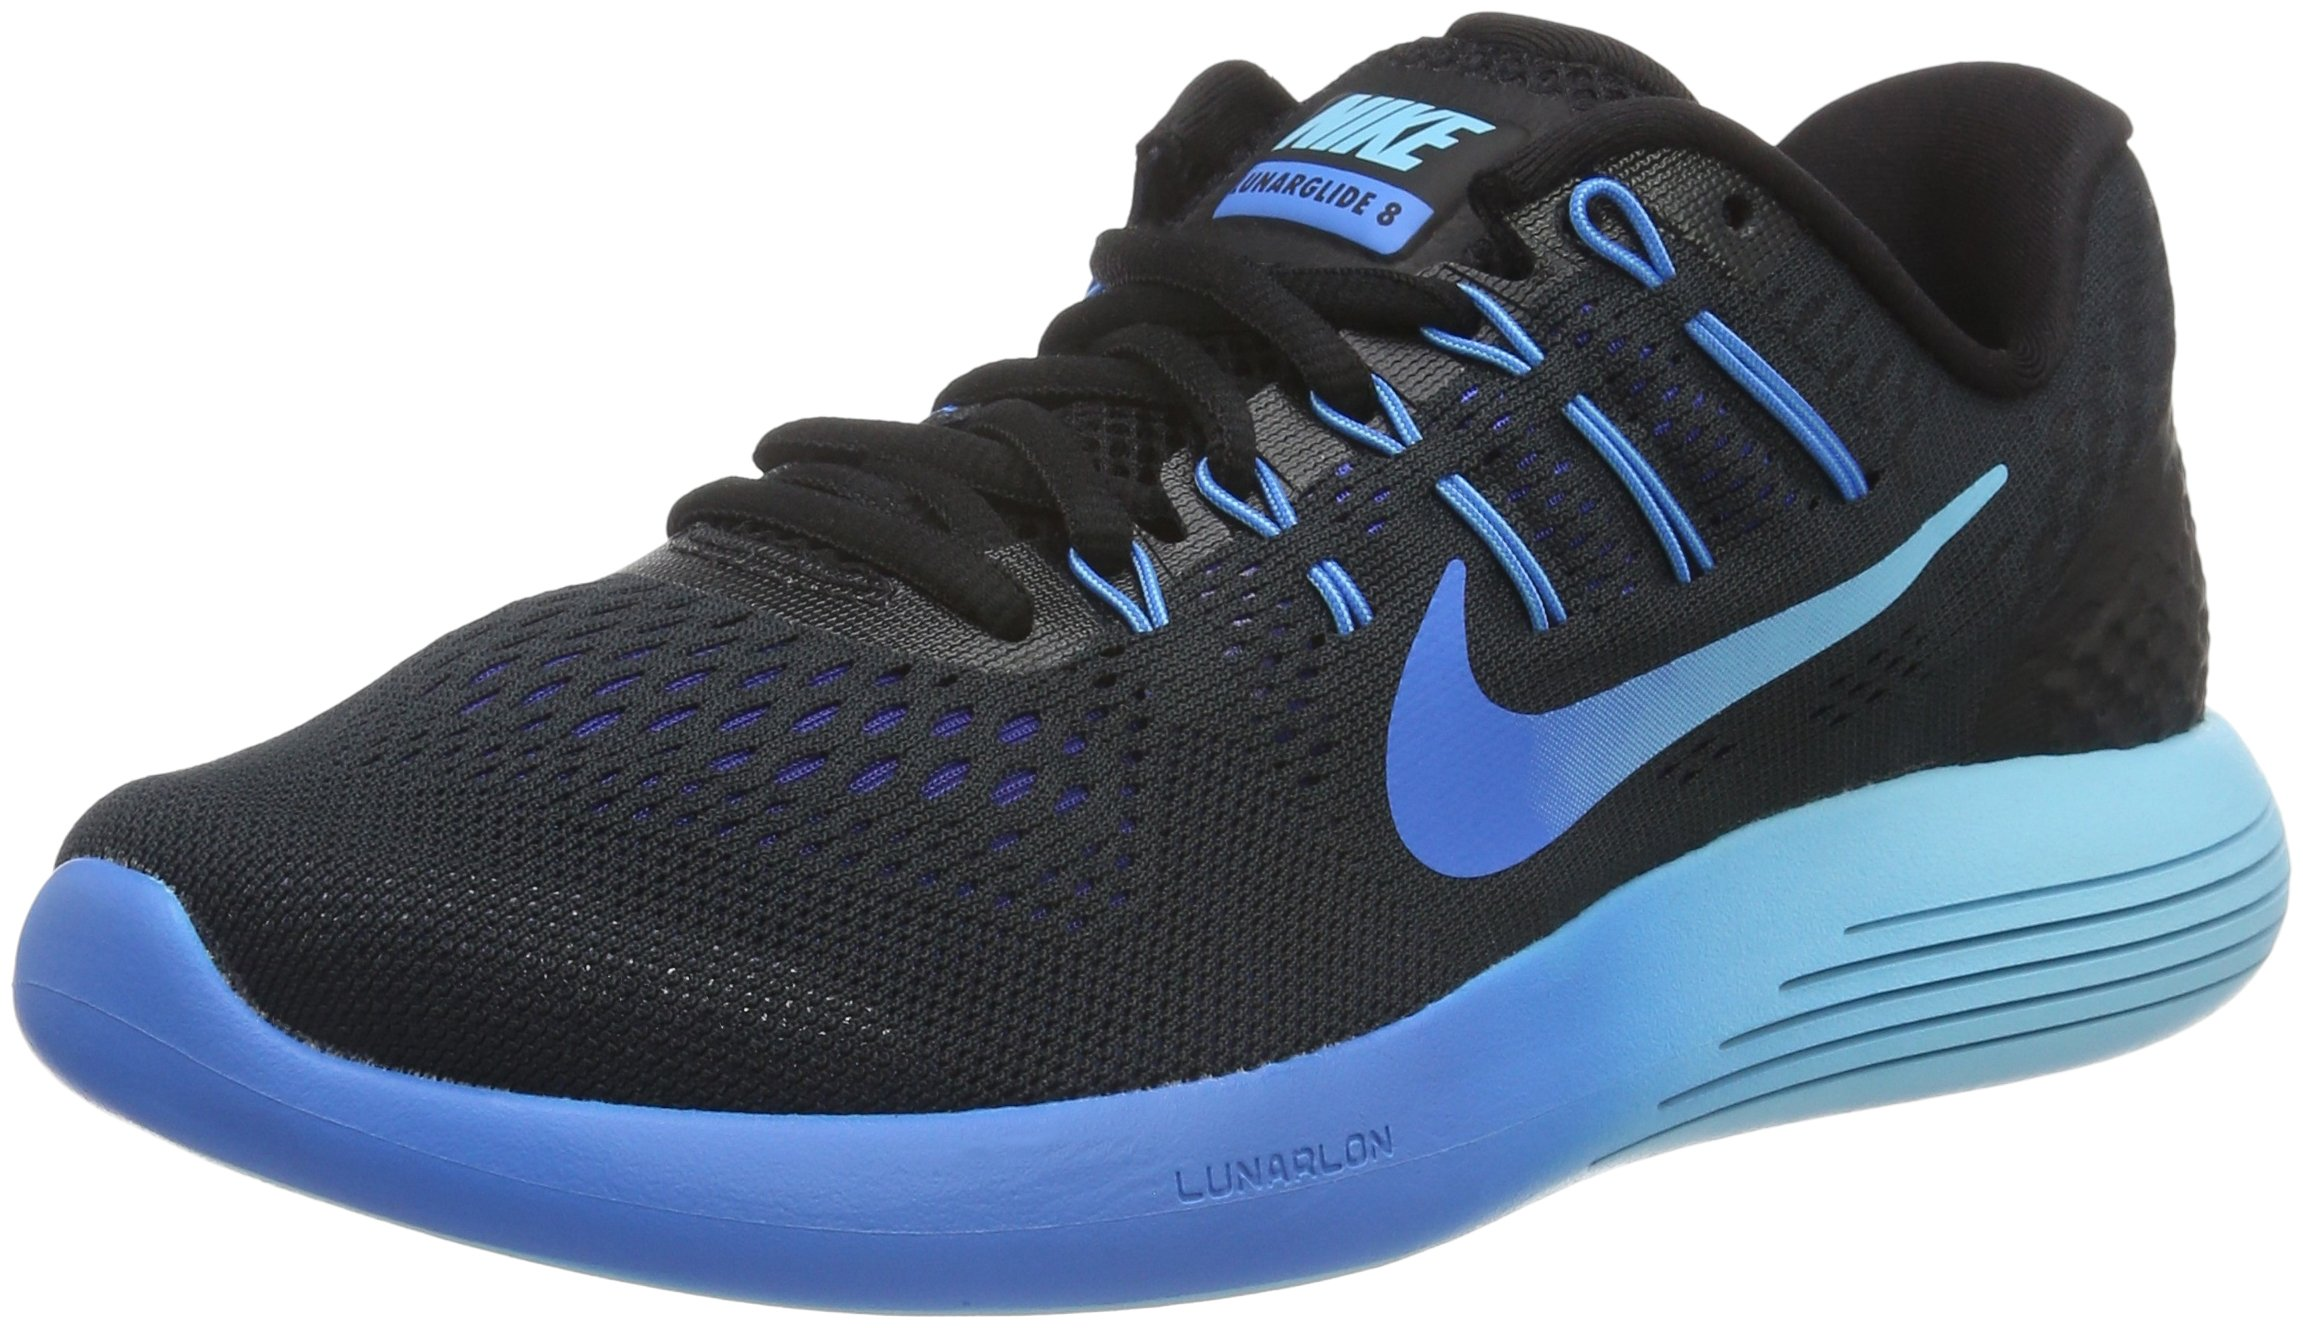 Nike Womens LunarGlide 8 OC Running Shoe Black/Multi Color/Deep Royal Blue 9 B(M) US